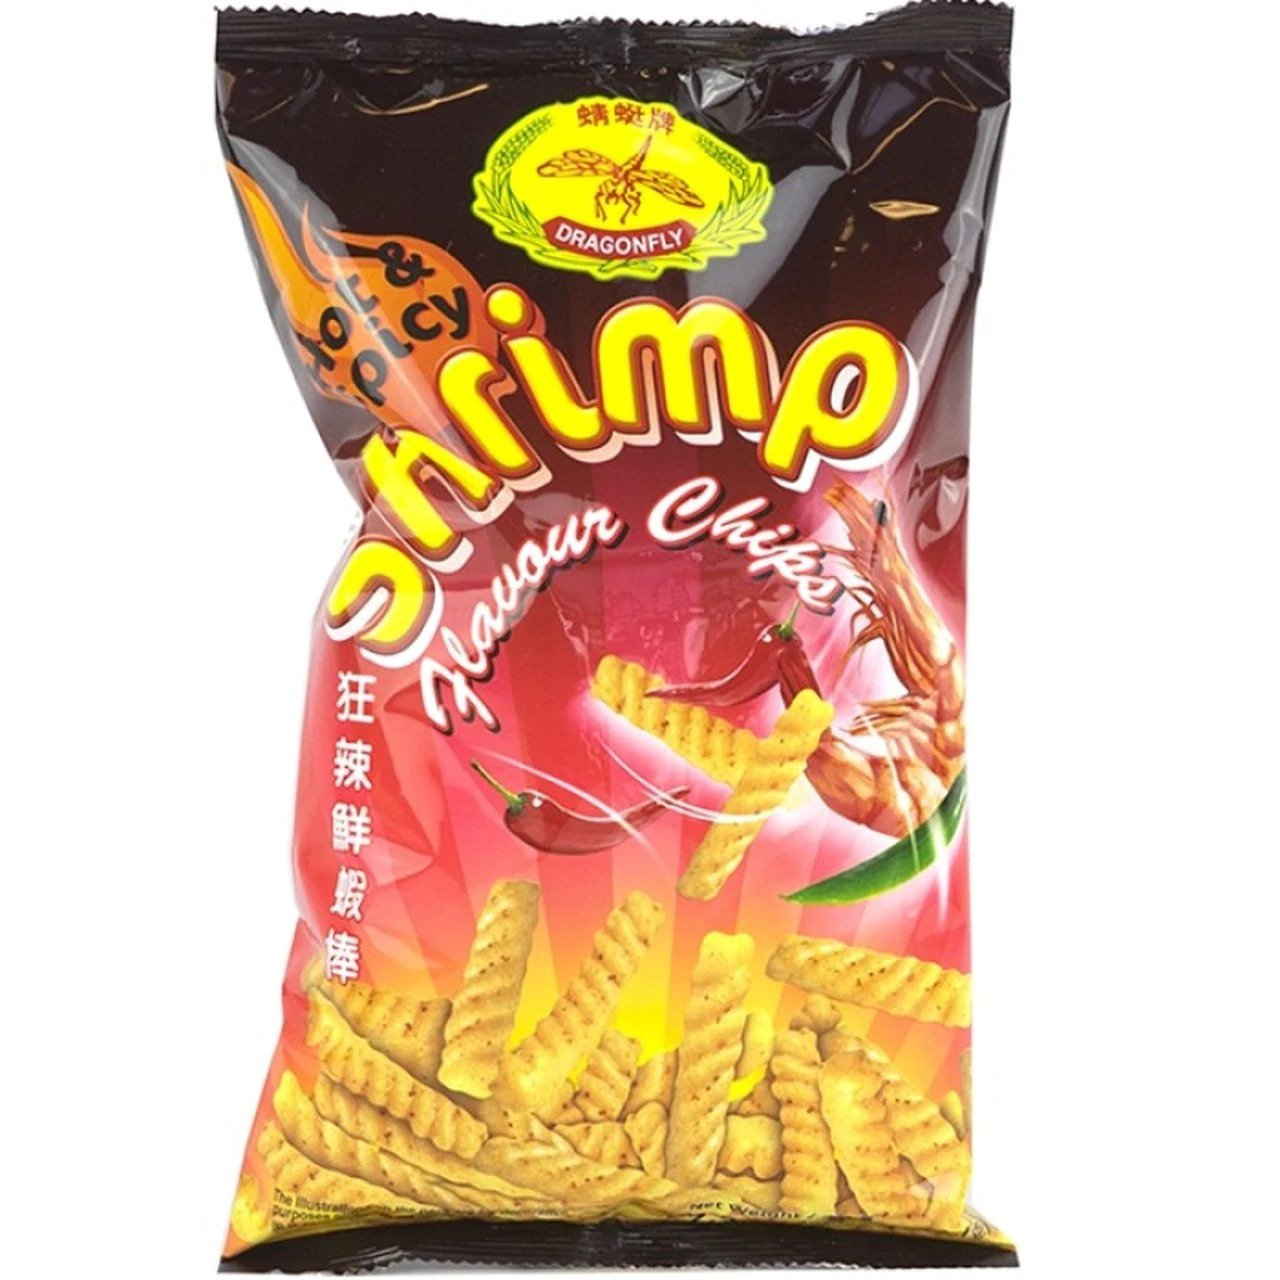 Dragonfly Shrimp Chips Hot & Spicy 7.3 Oz